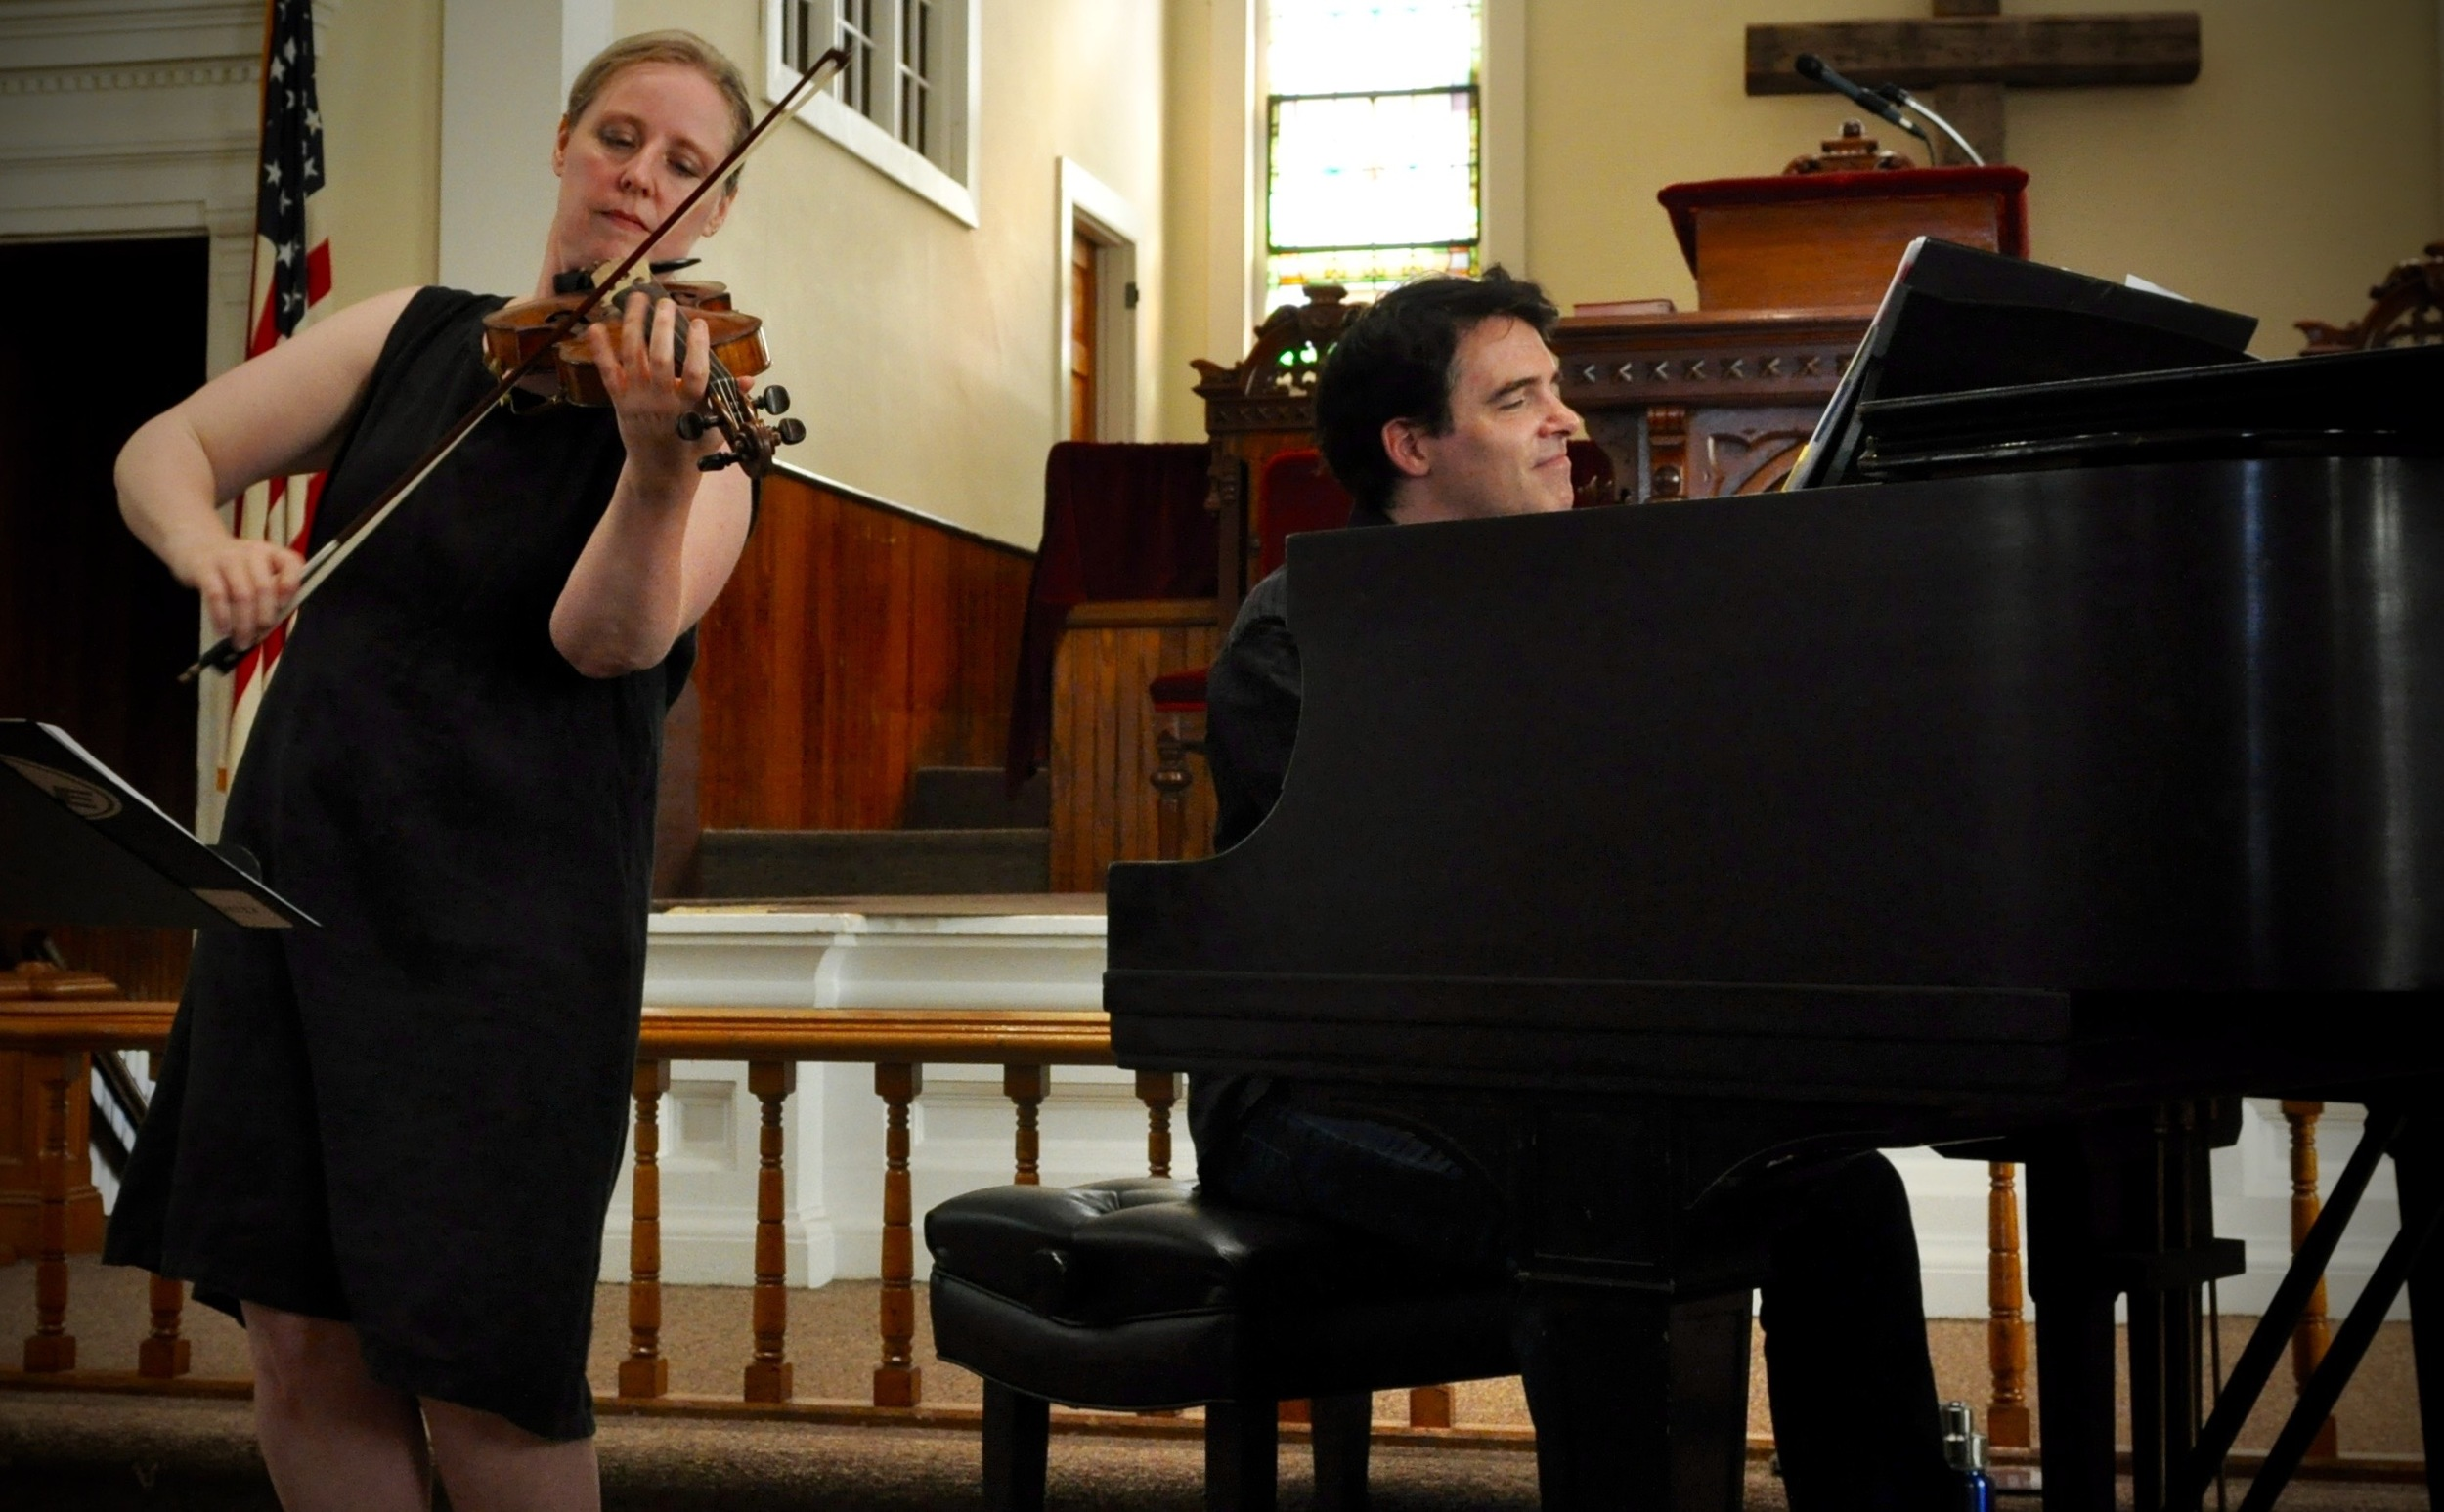 Fiddler Gretchen Koehler and pianist Daniel Kelly. Photo: Alicia Bodmer